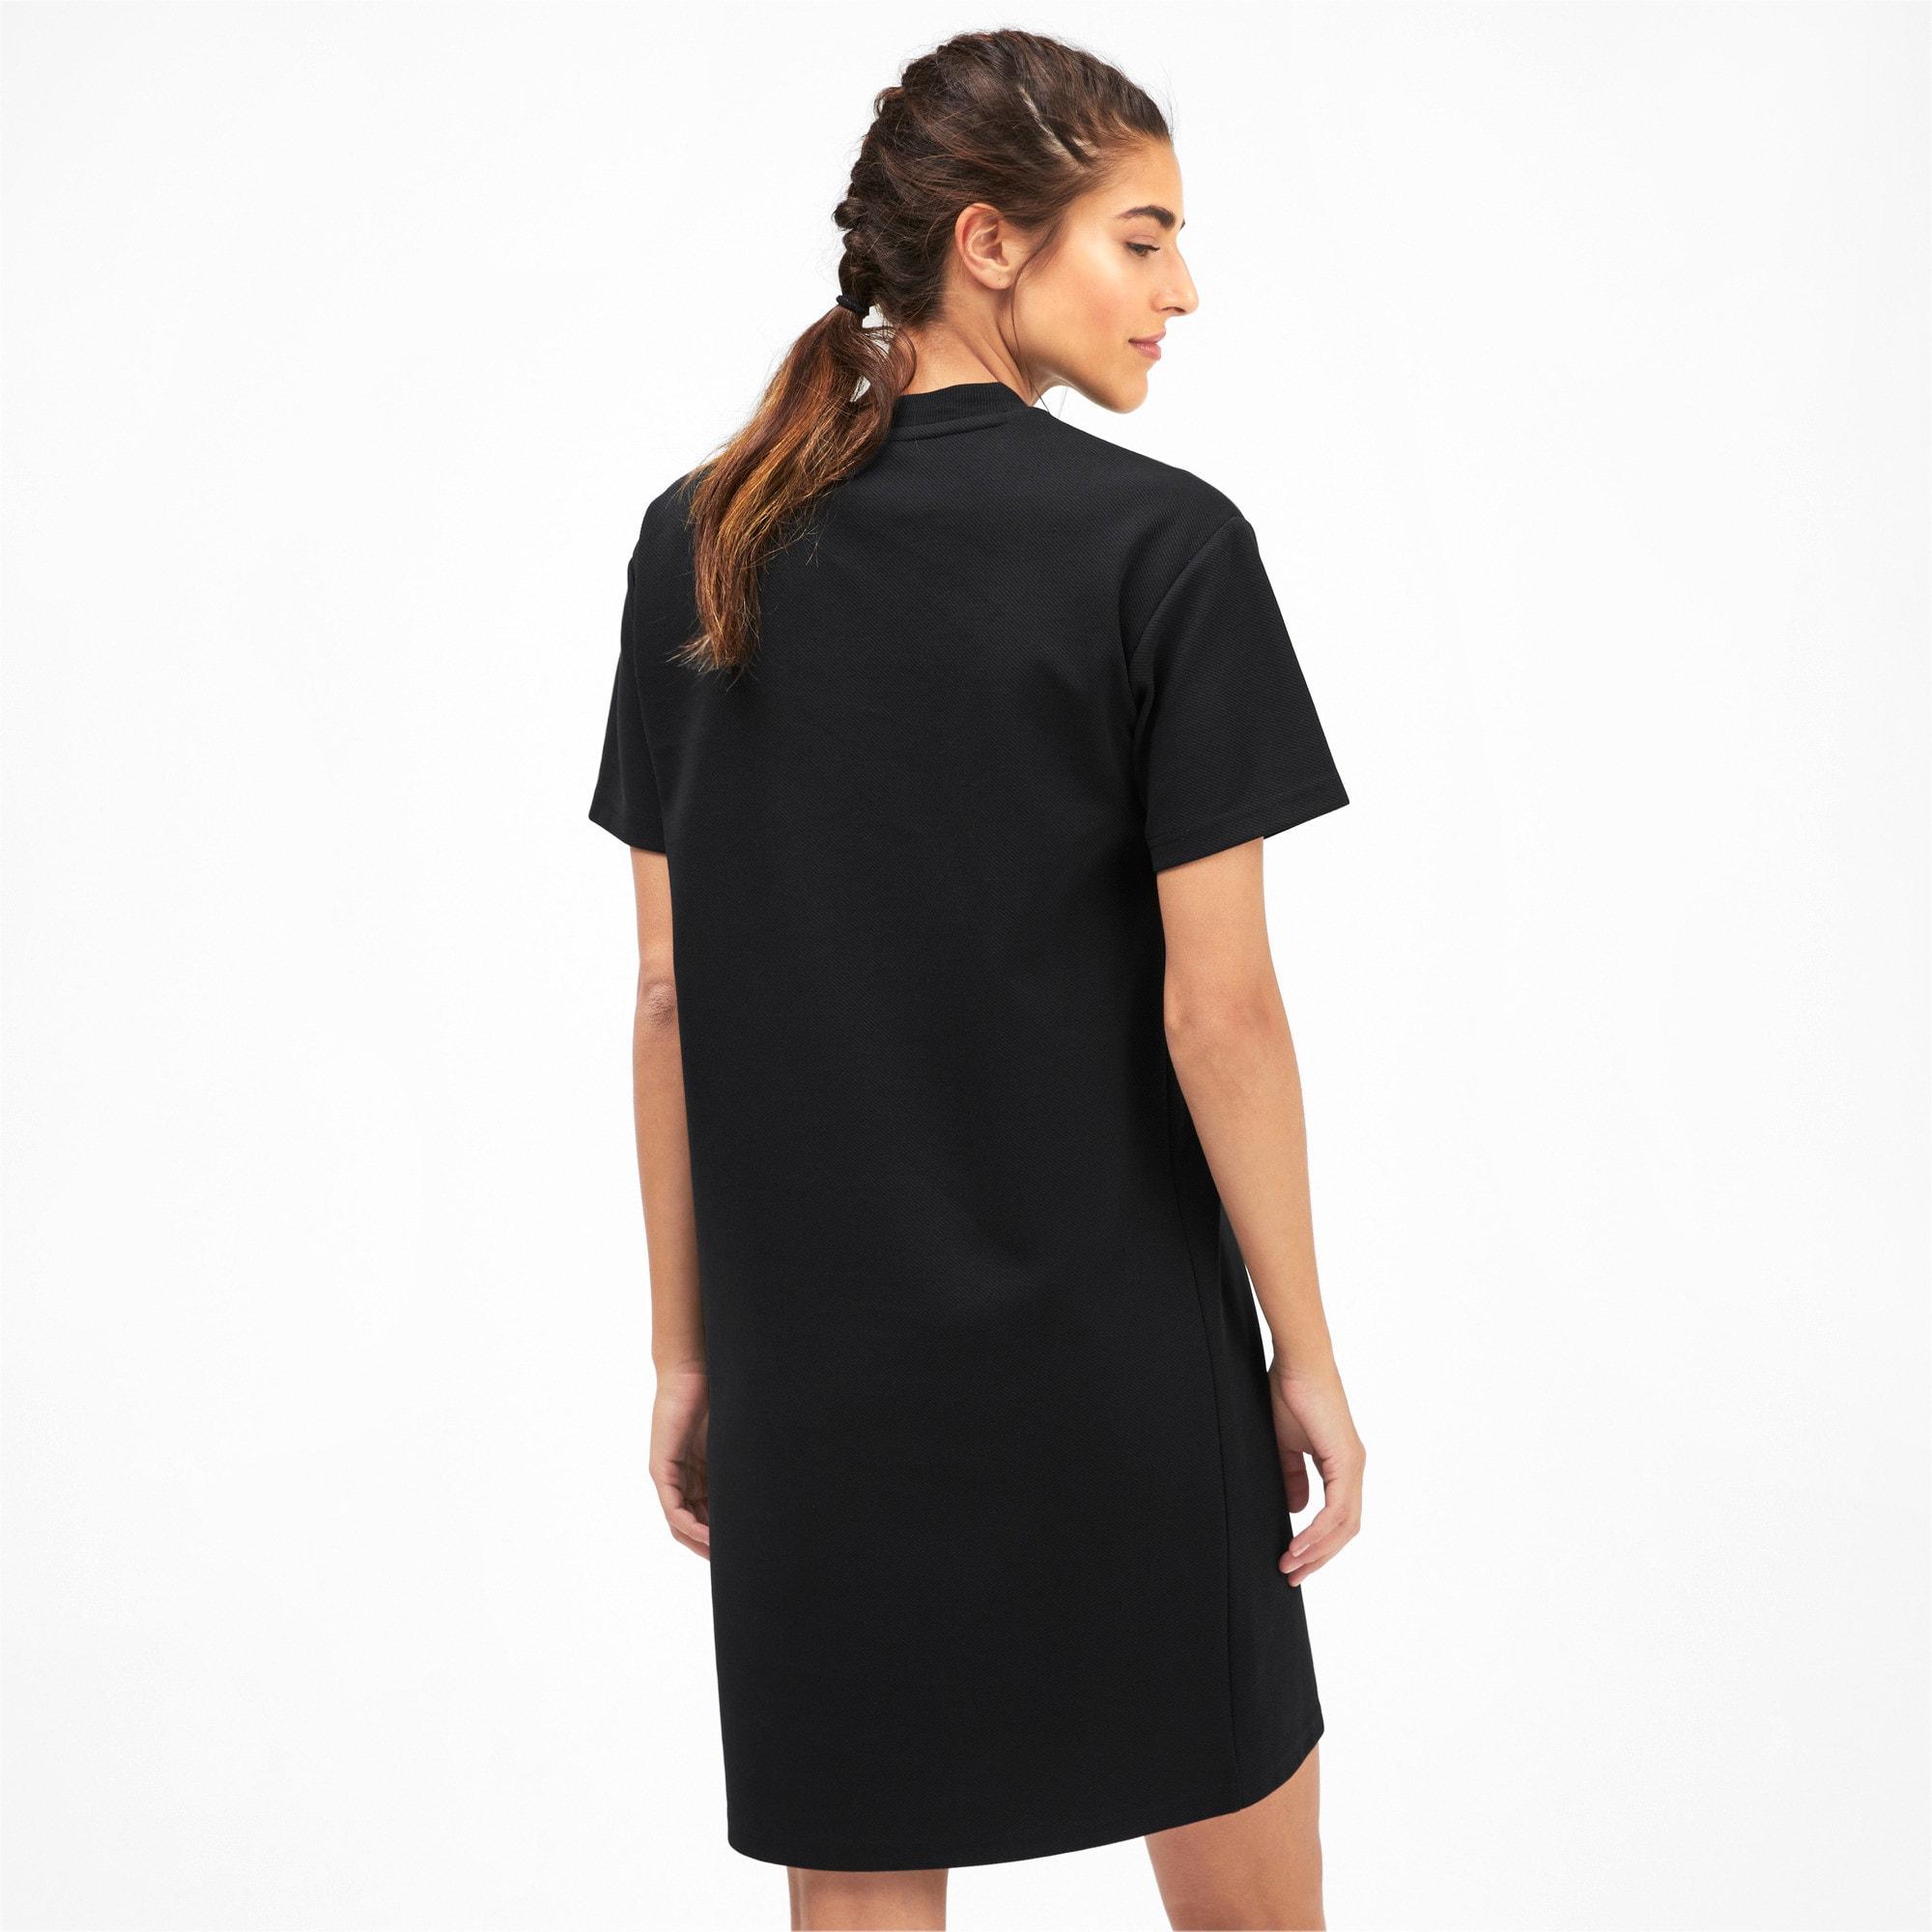 Anteprima 2 di Downtown Women's Dress, Puma Black, medio